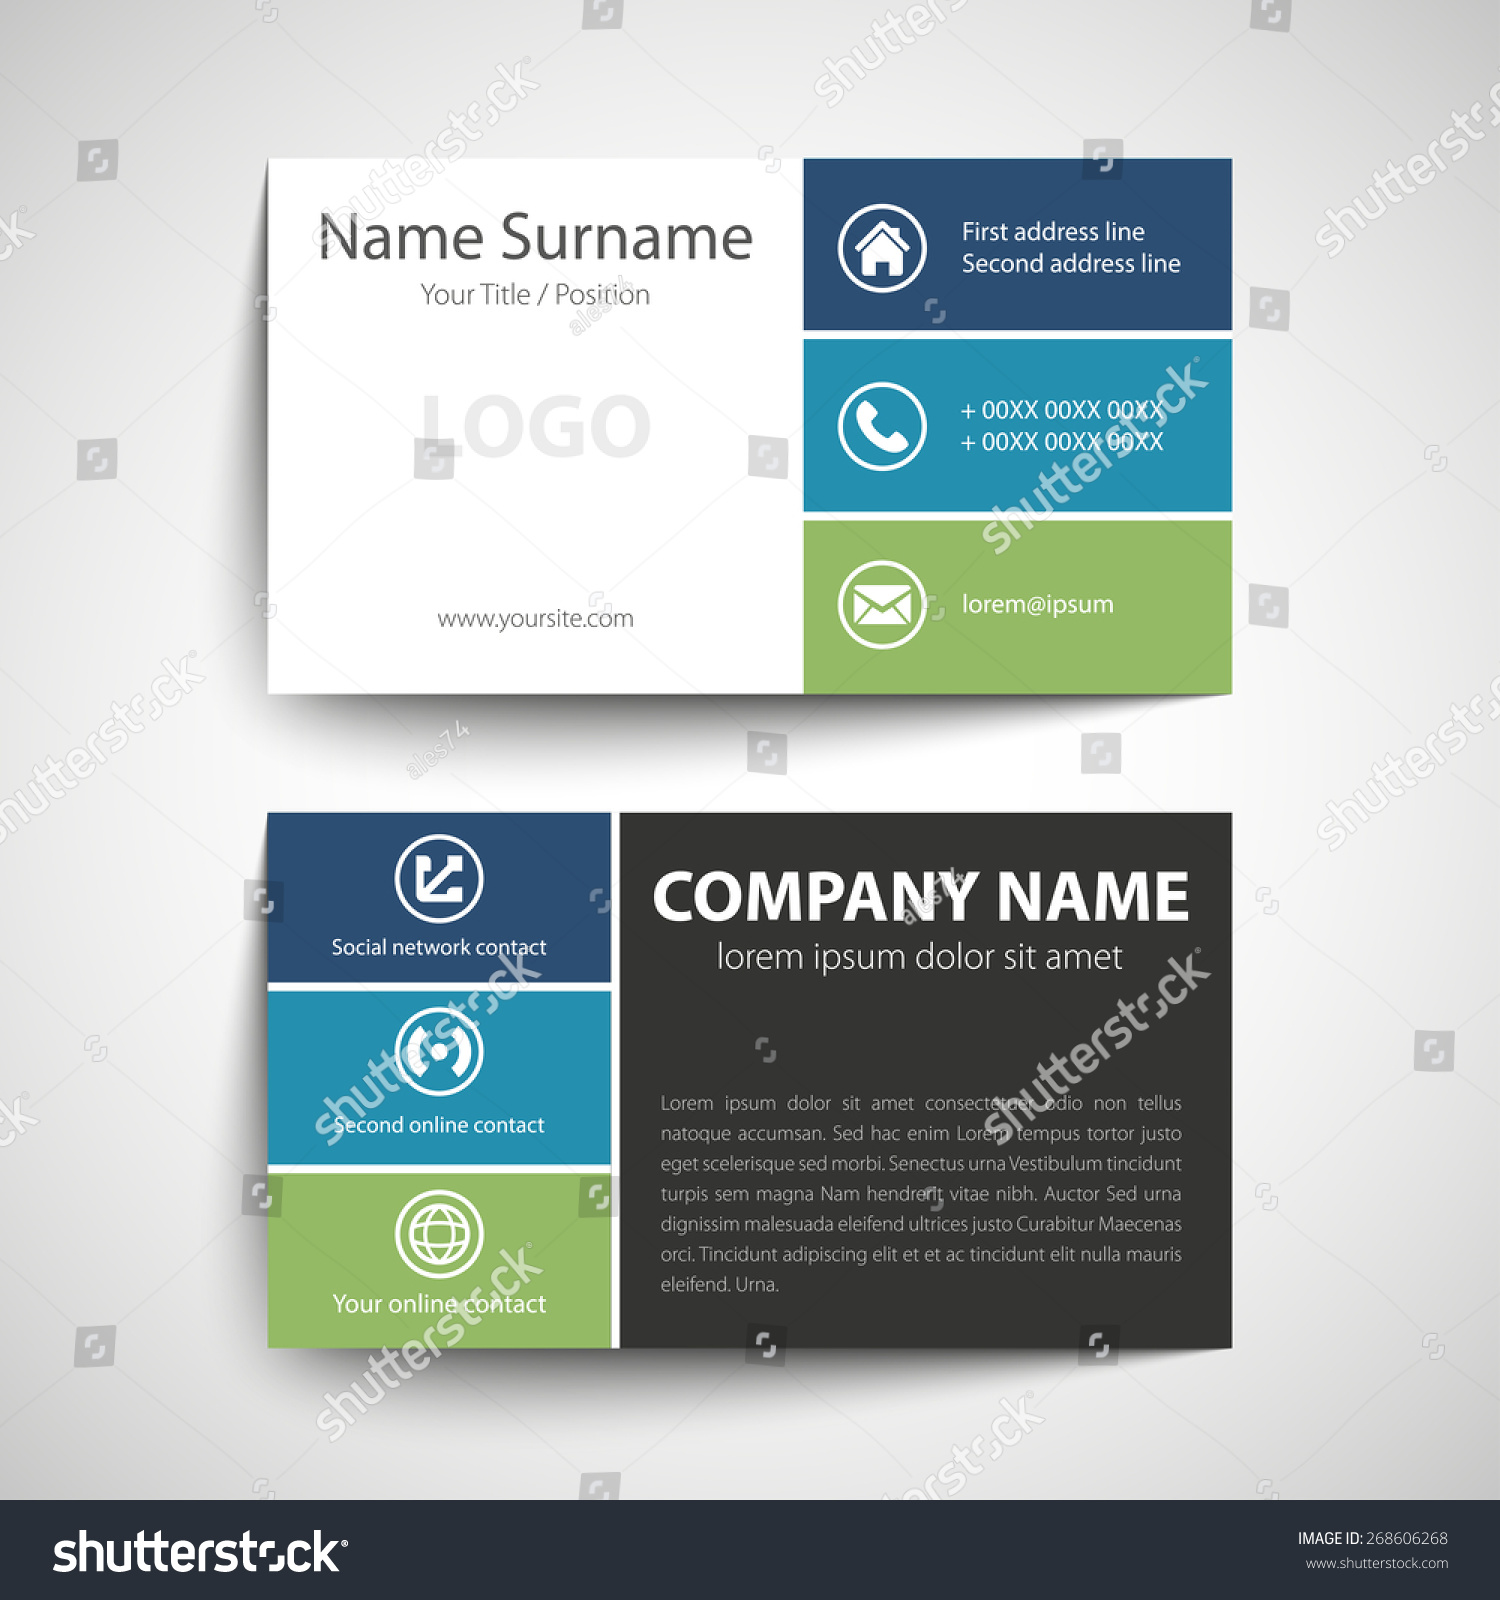 Modern Simple Business Card Template Vector Stock Vector 268606268 ...